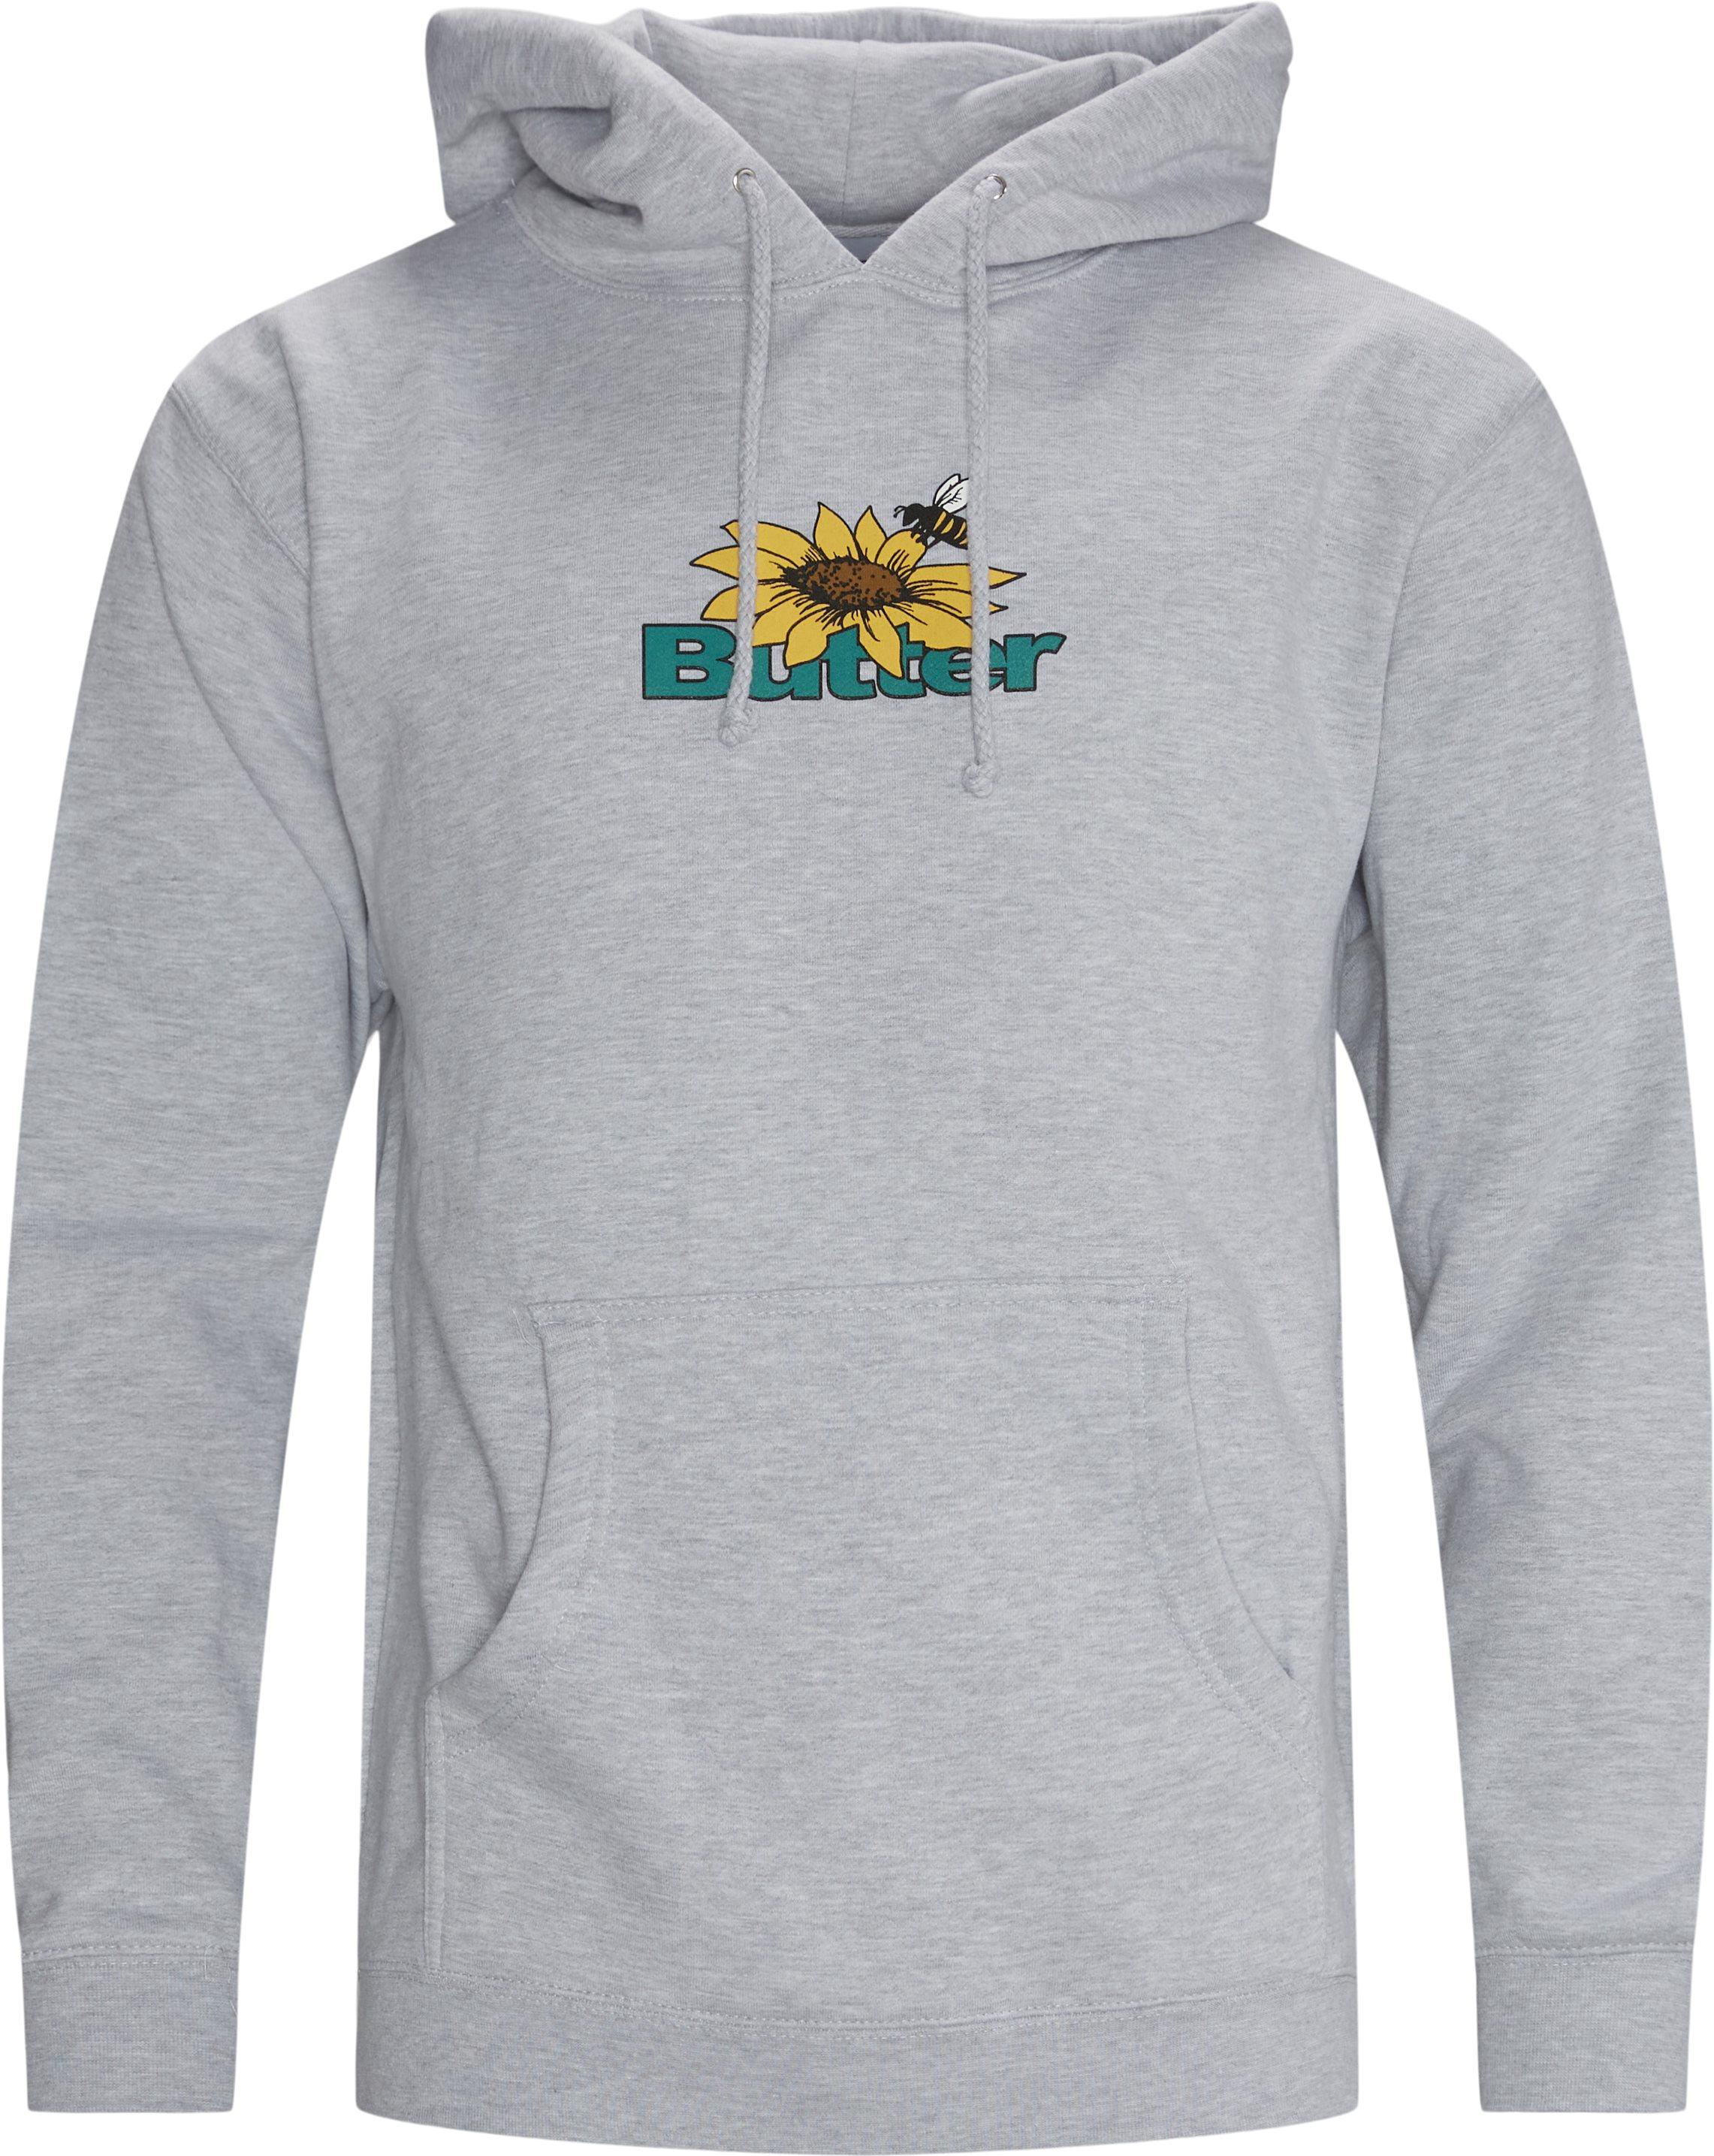 Sunflower Hoodie - Sweatshirts - Regular fit - Grå